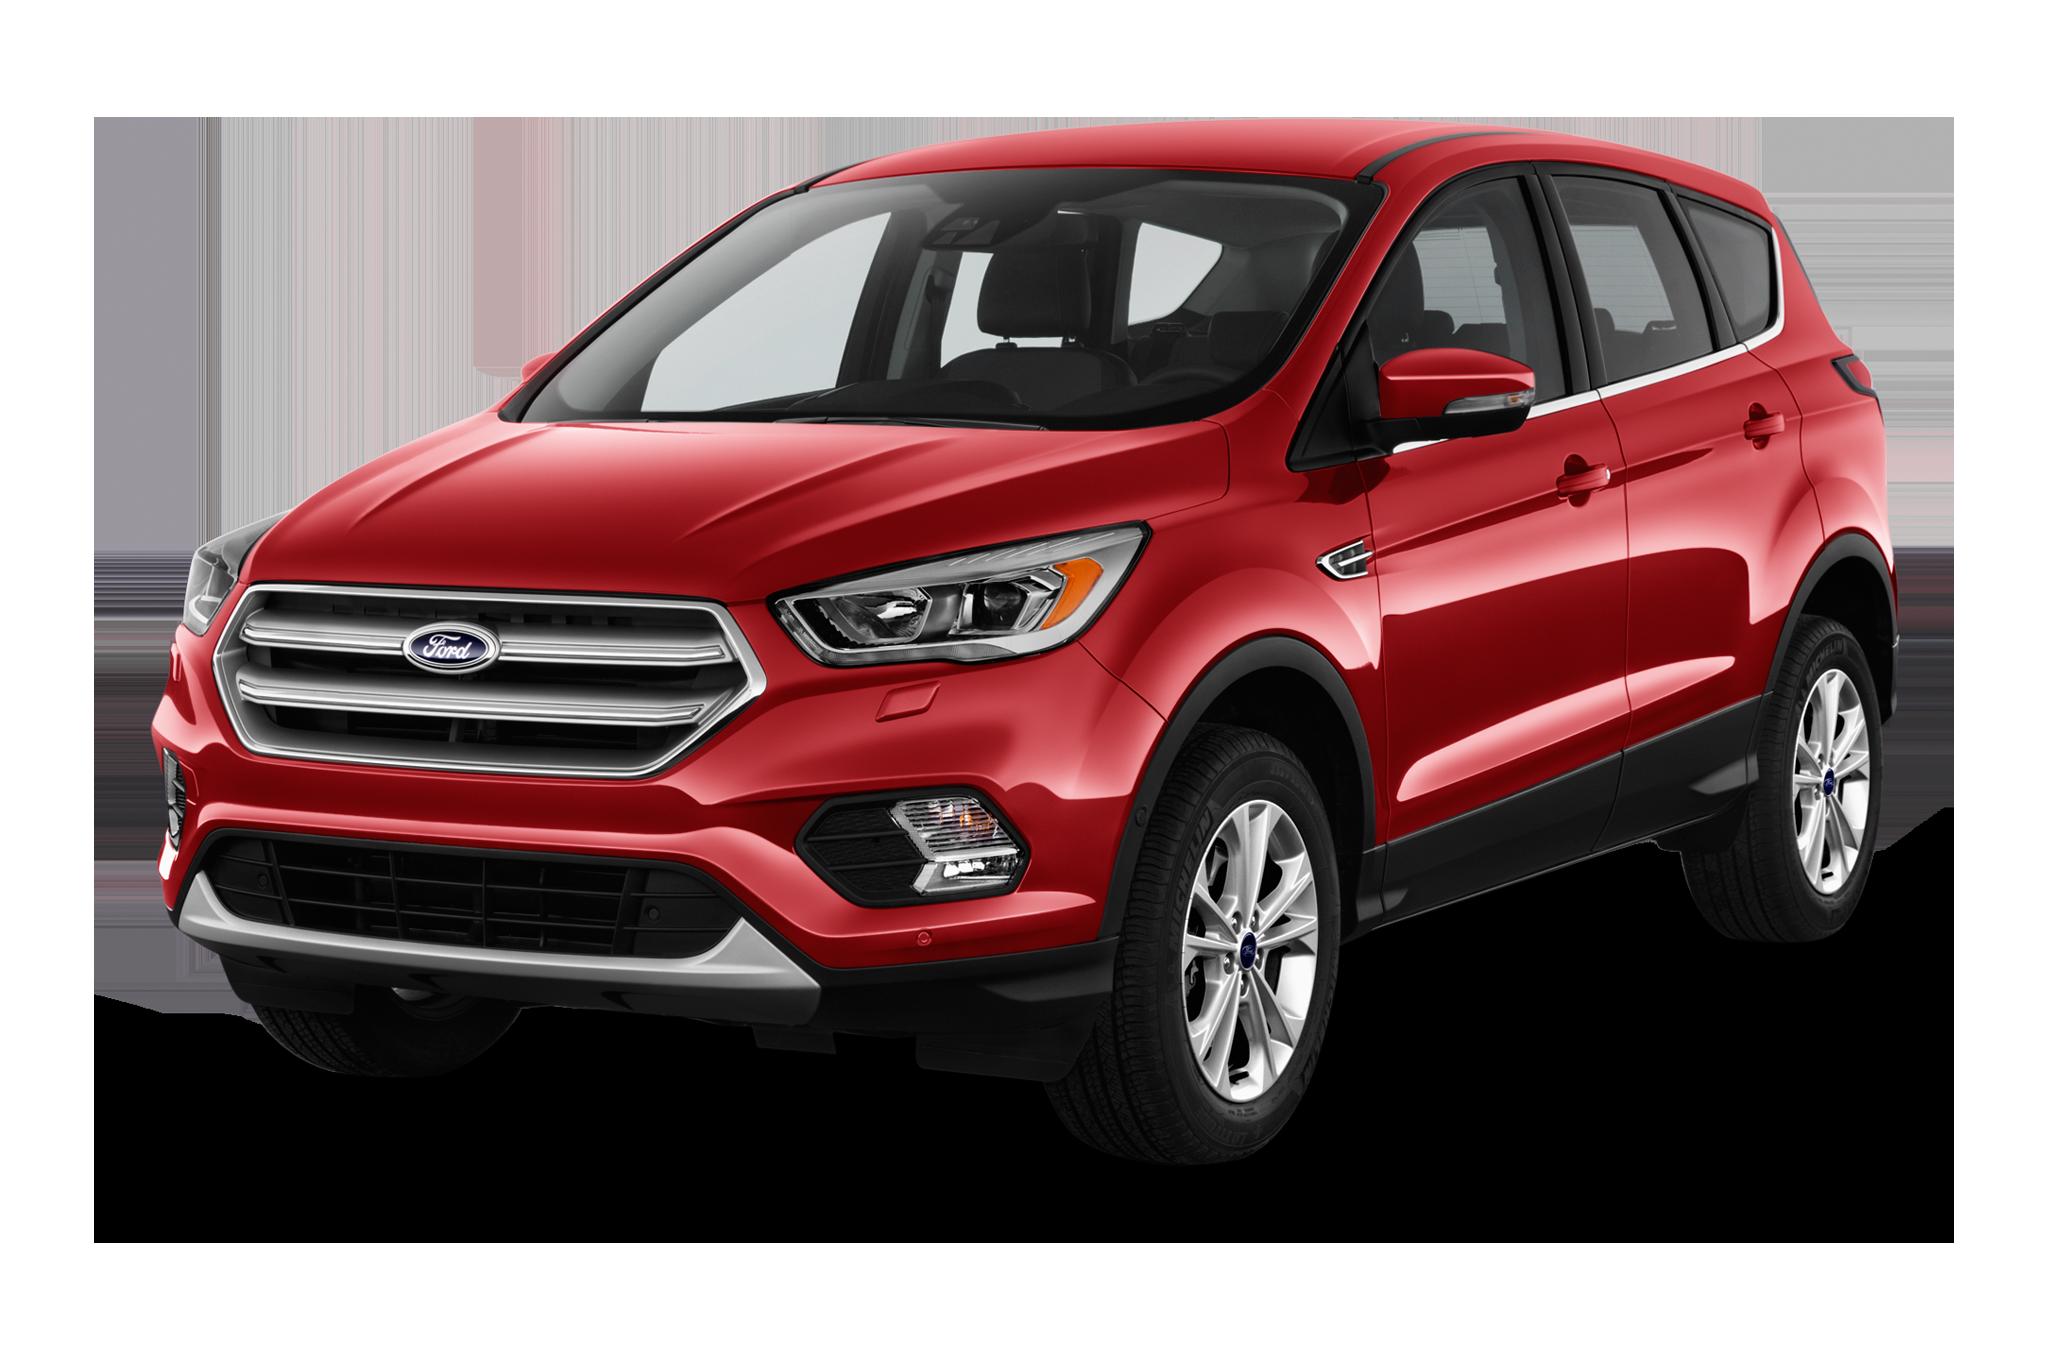 Ford Ranger Leasing Angebote : ford mustang leasing angebote privat gewerbe auch gt ~ Aude.kayakingforconservation.com Haus und Dekorationen